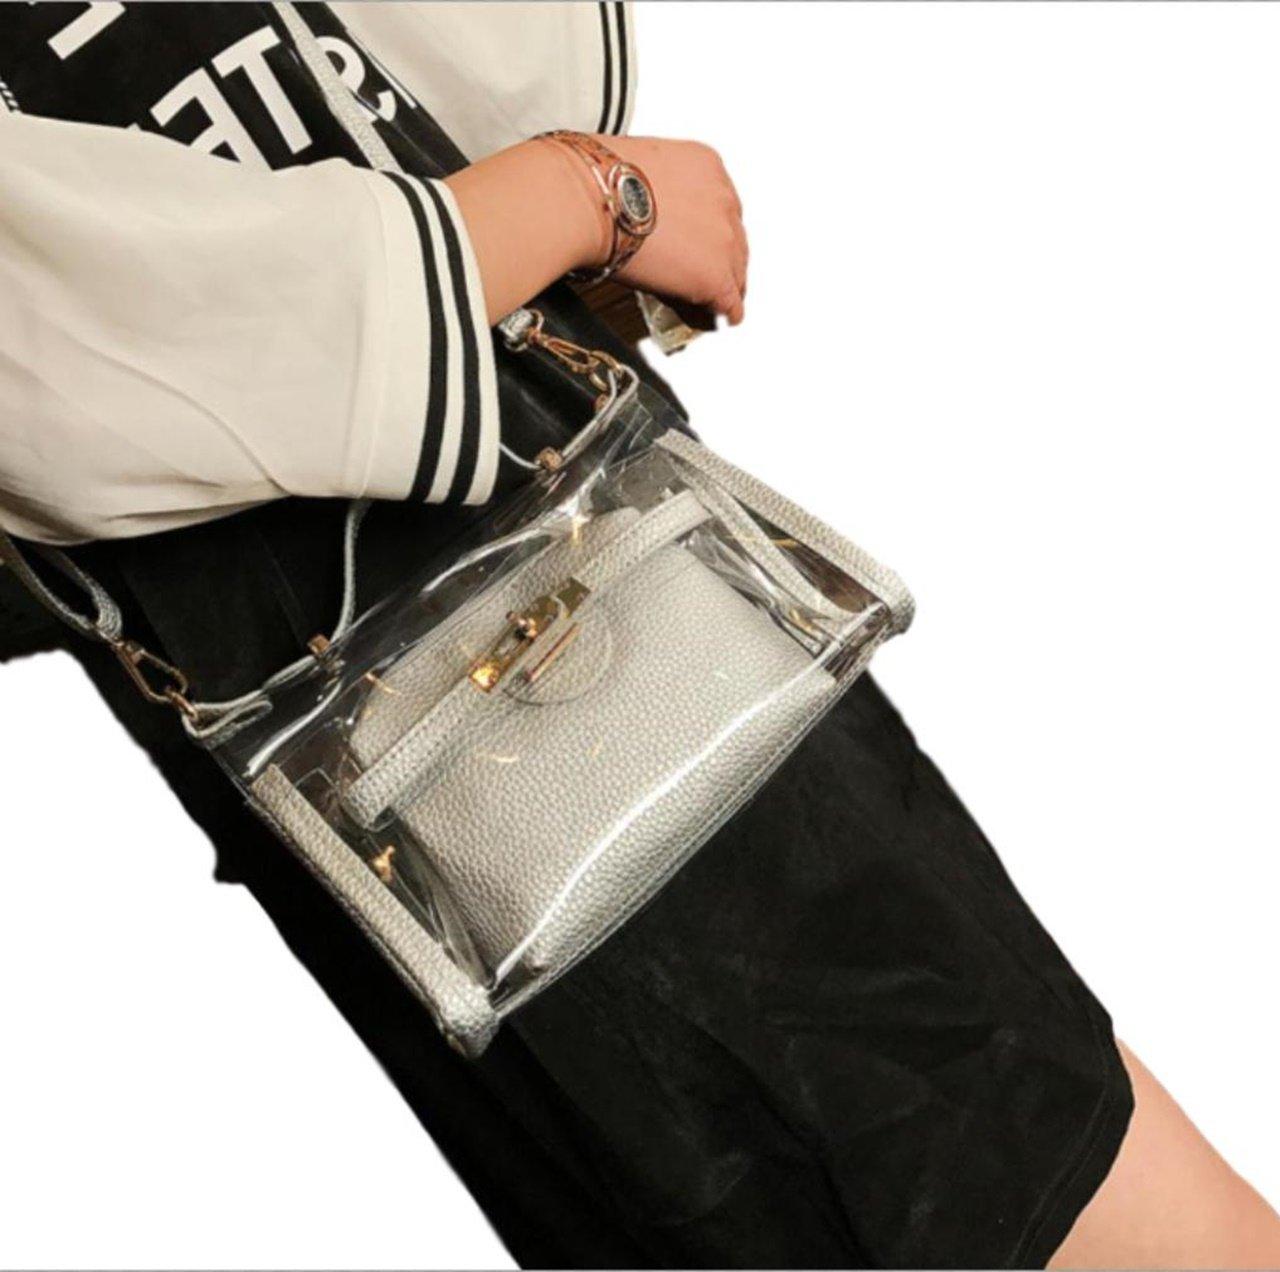 ten is heart Clear bag Plastic Women Handbag summer shoulder Pouch set Waterproof (Medium, Silver)